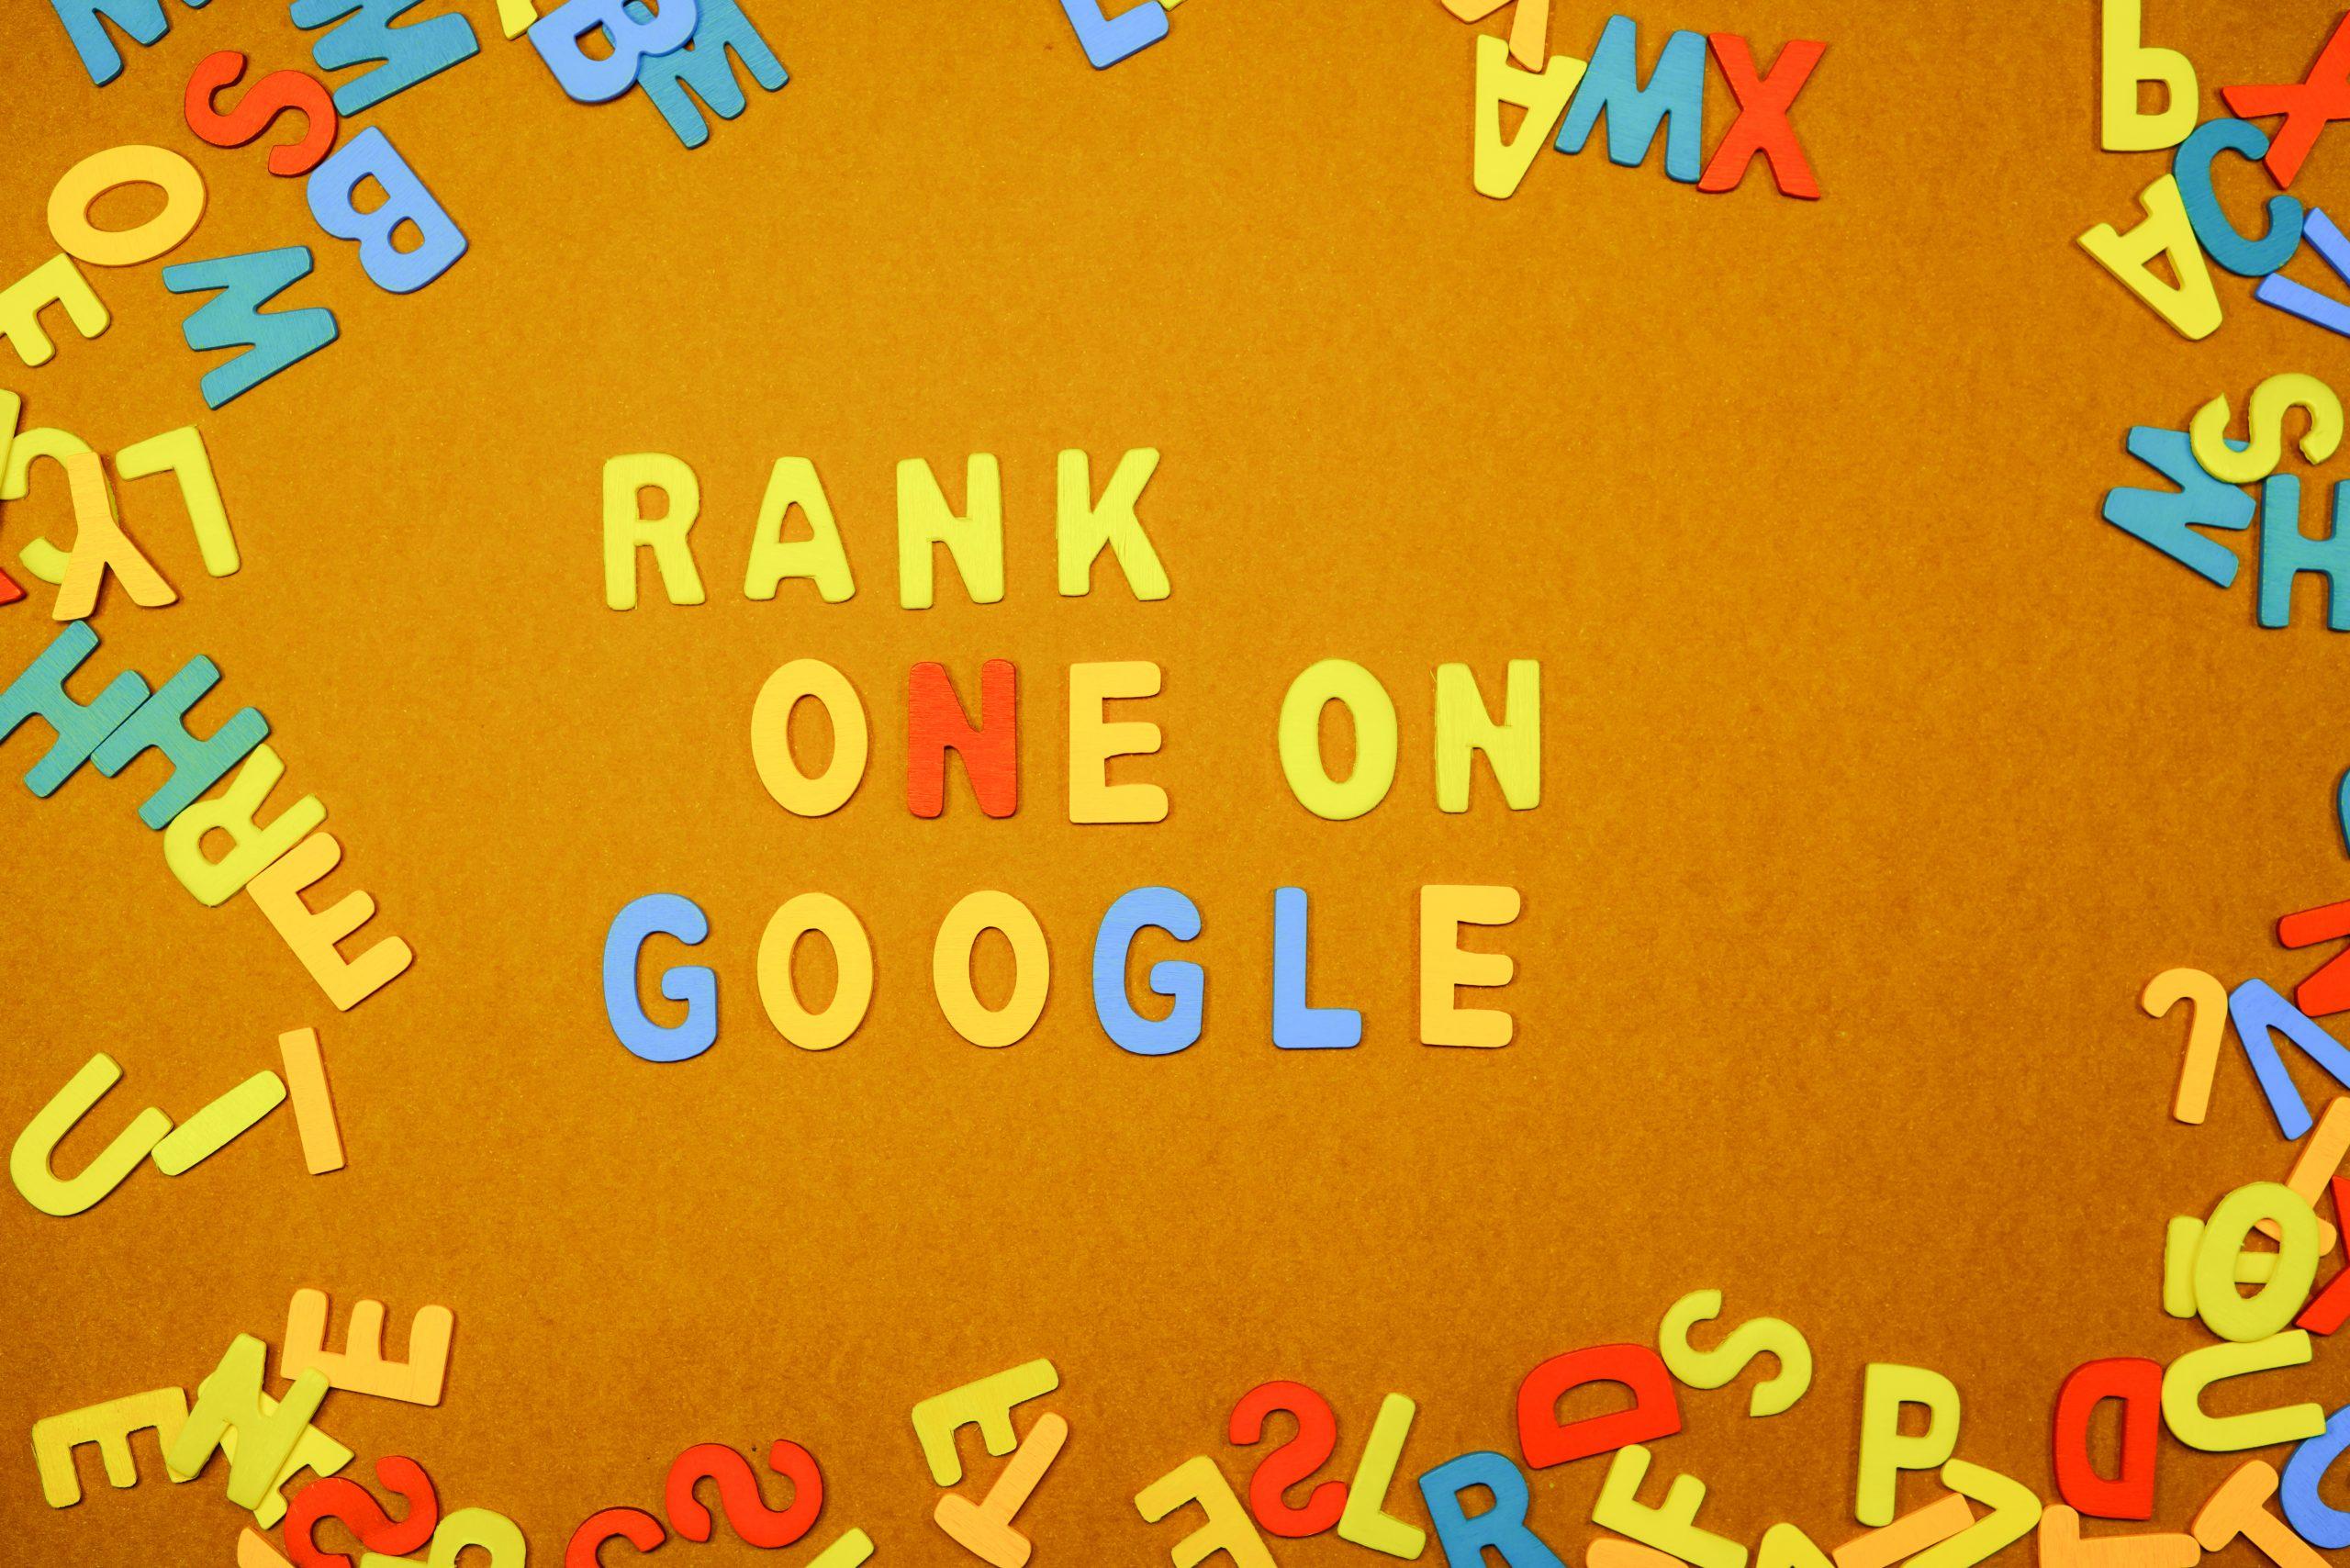 Rank one on google